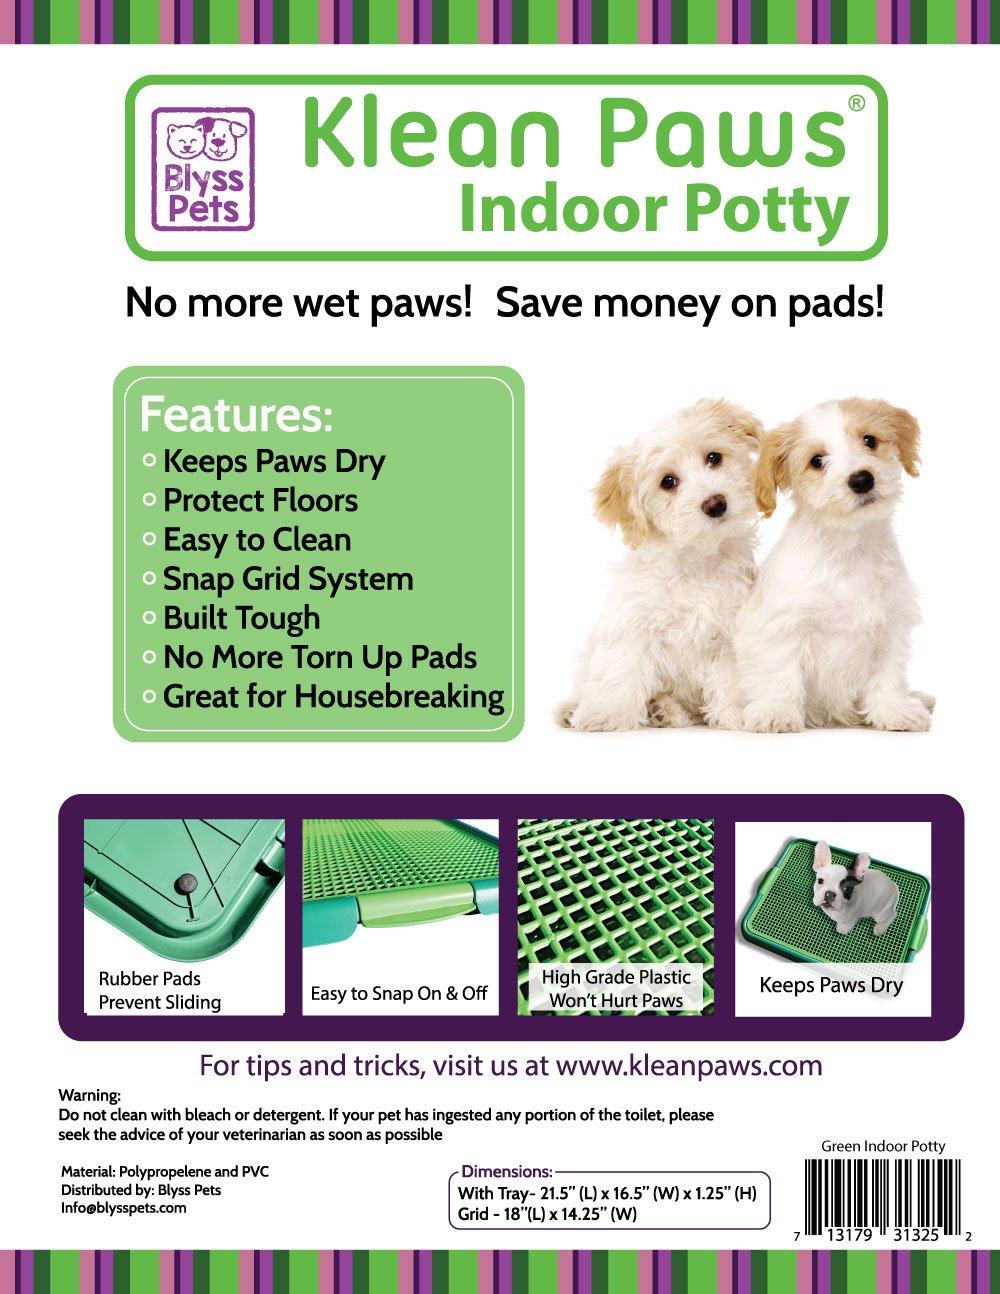 Amazon.com : Klean Paws Indoor Dog Potty, No Torn Potty Pads! Keep ...